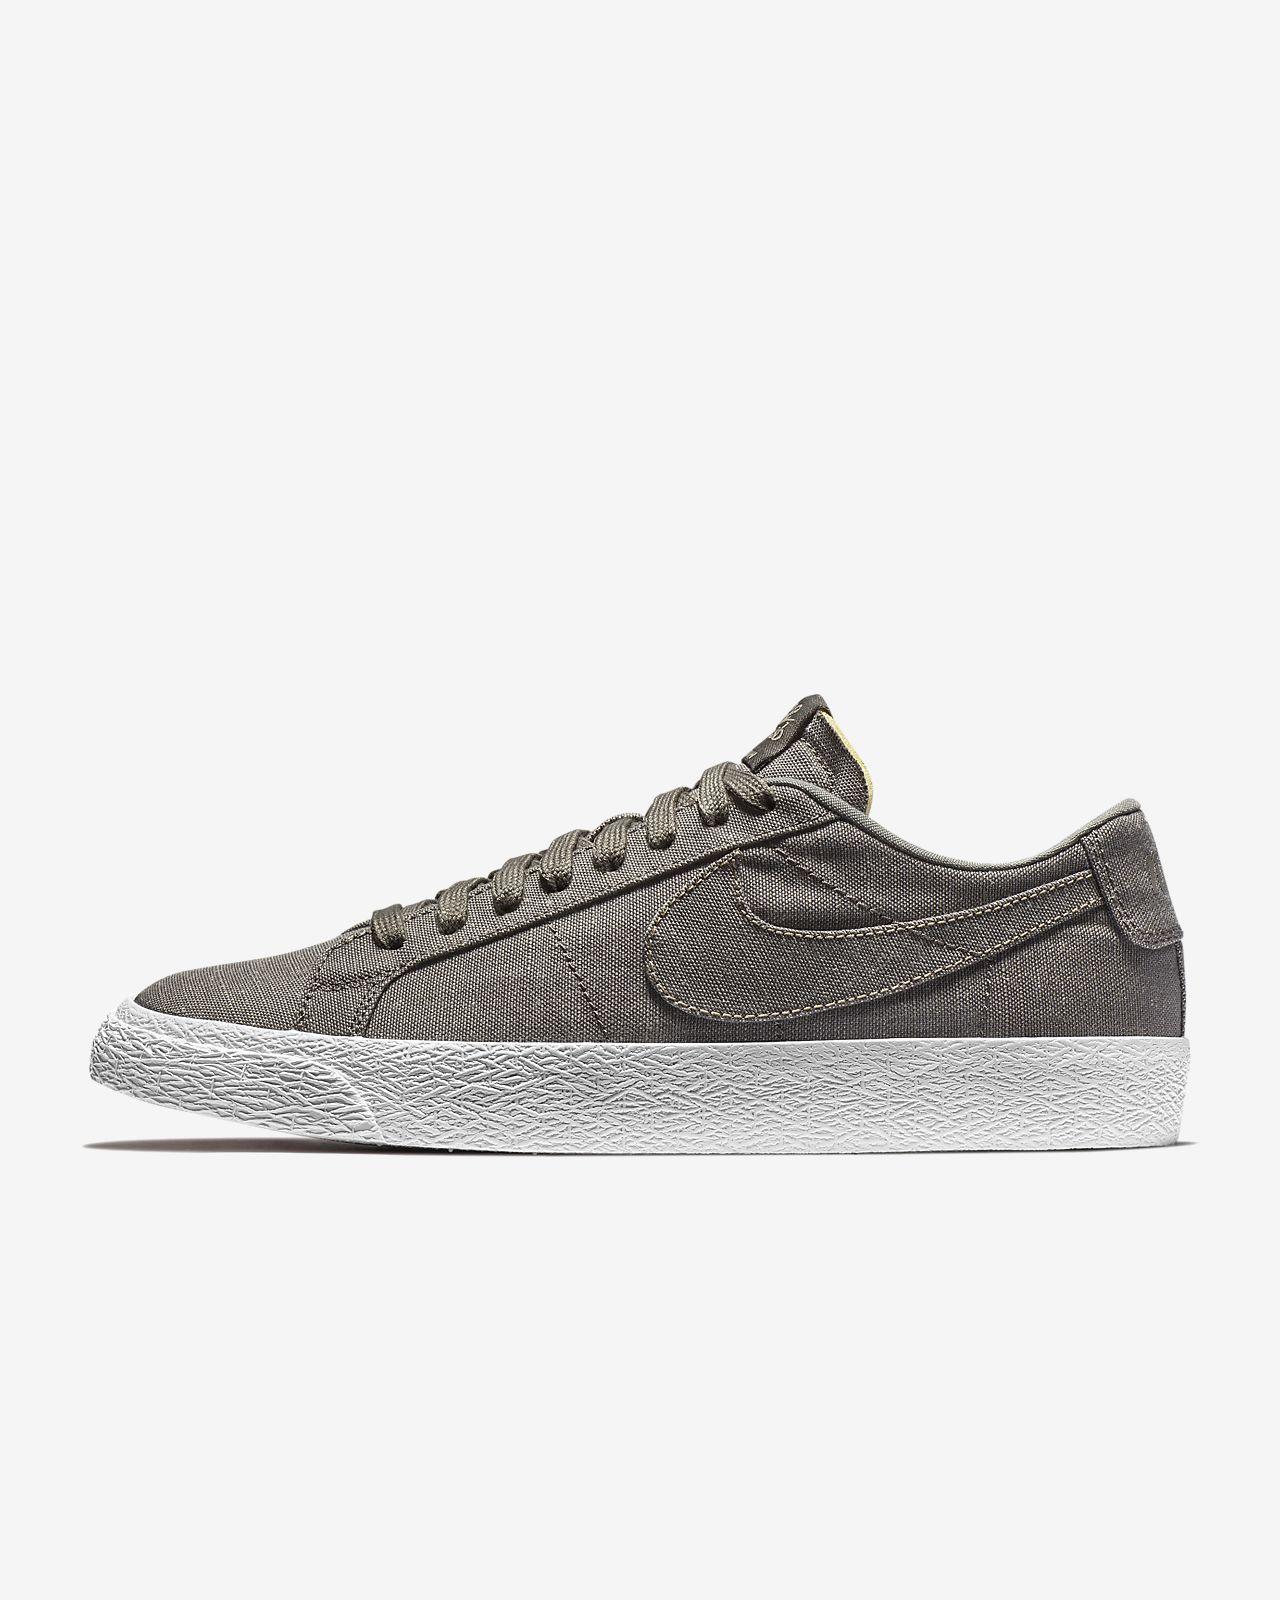 Nike - Blazer Faible Taille Kaki / Vert / Beige: 42,5